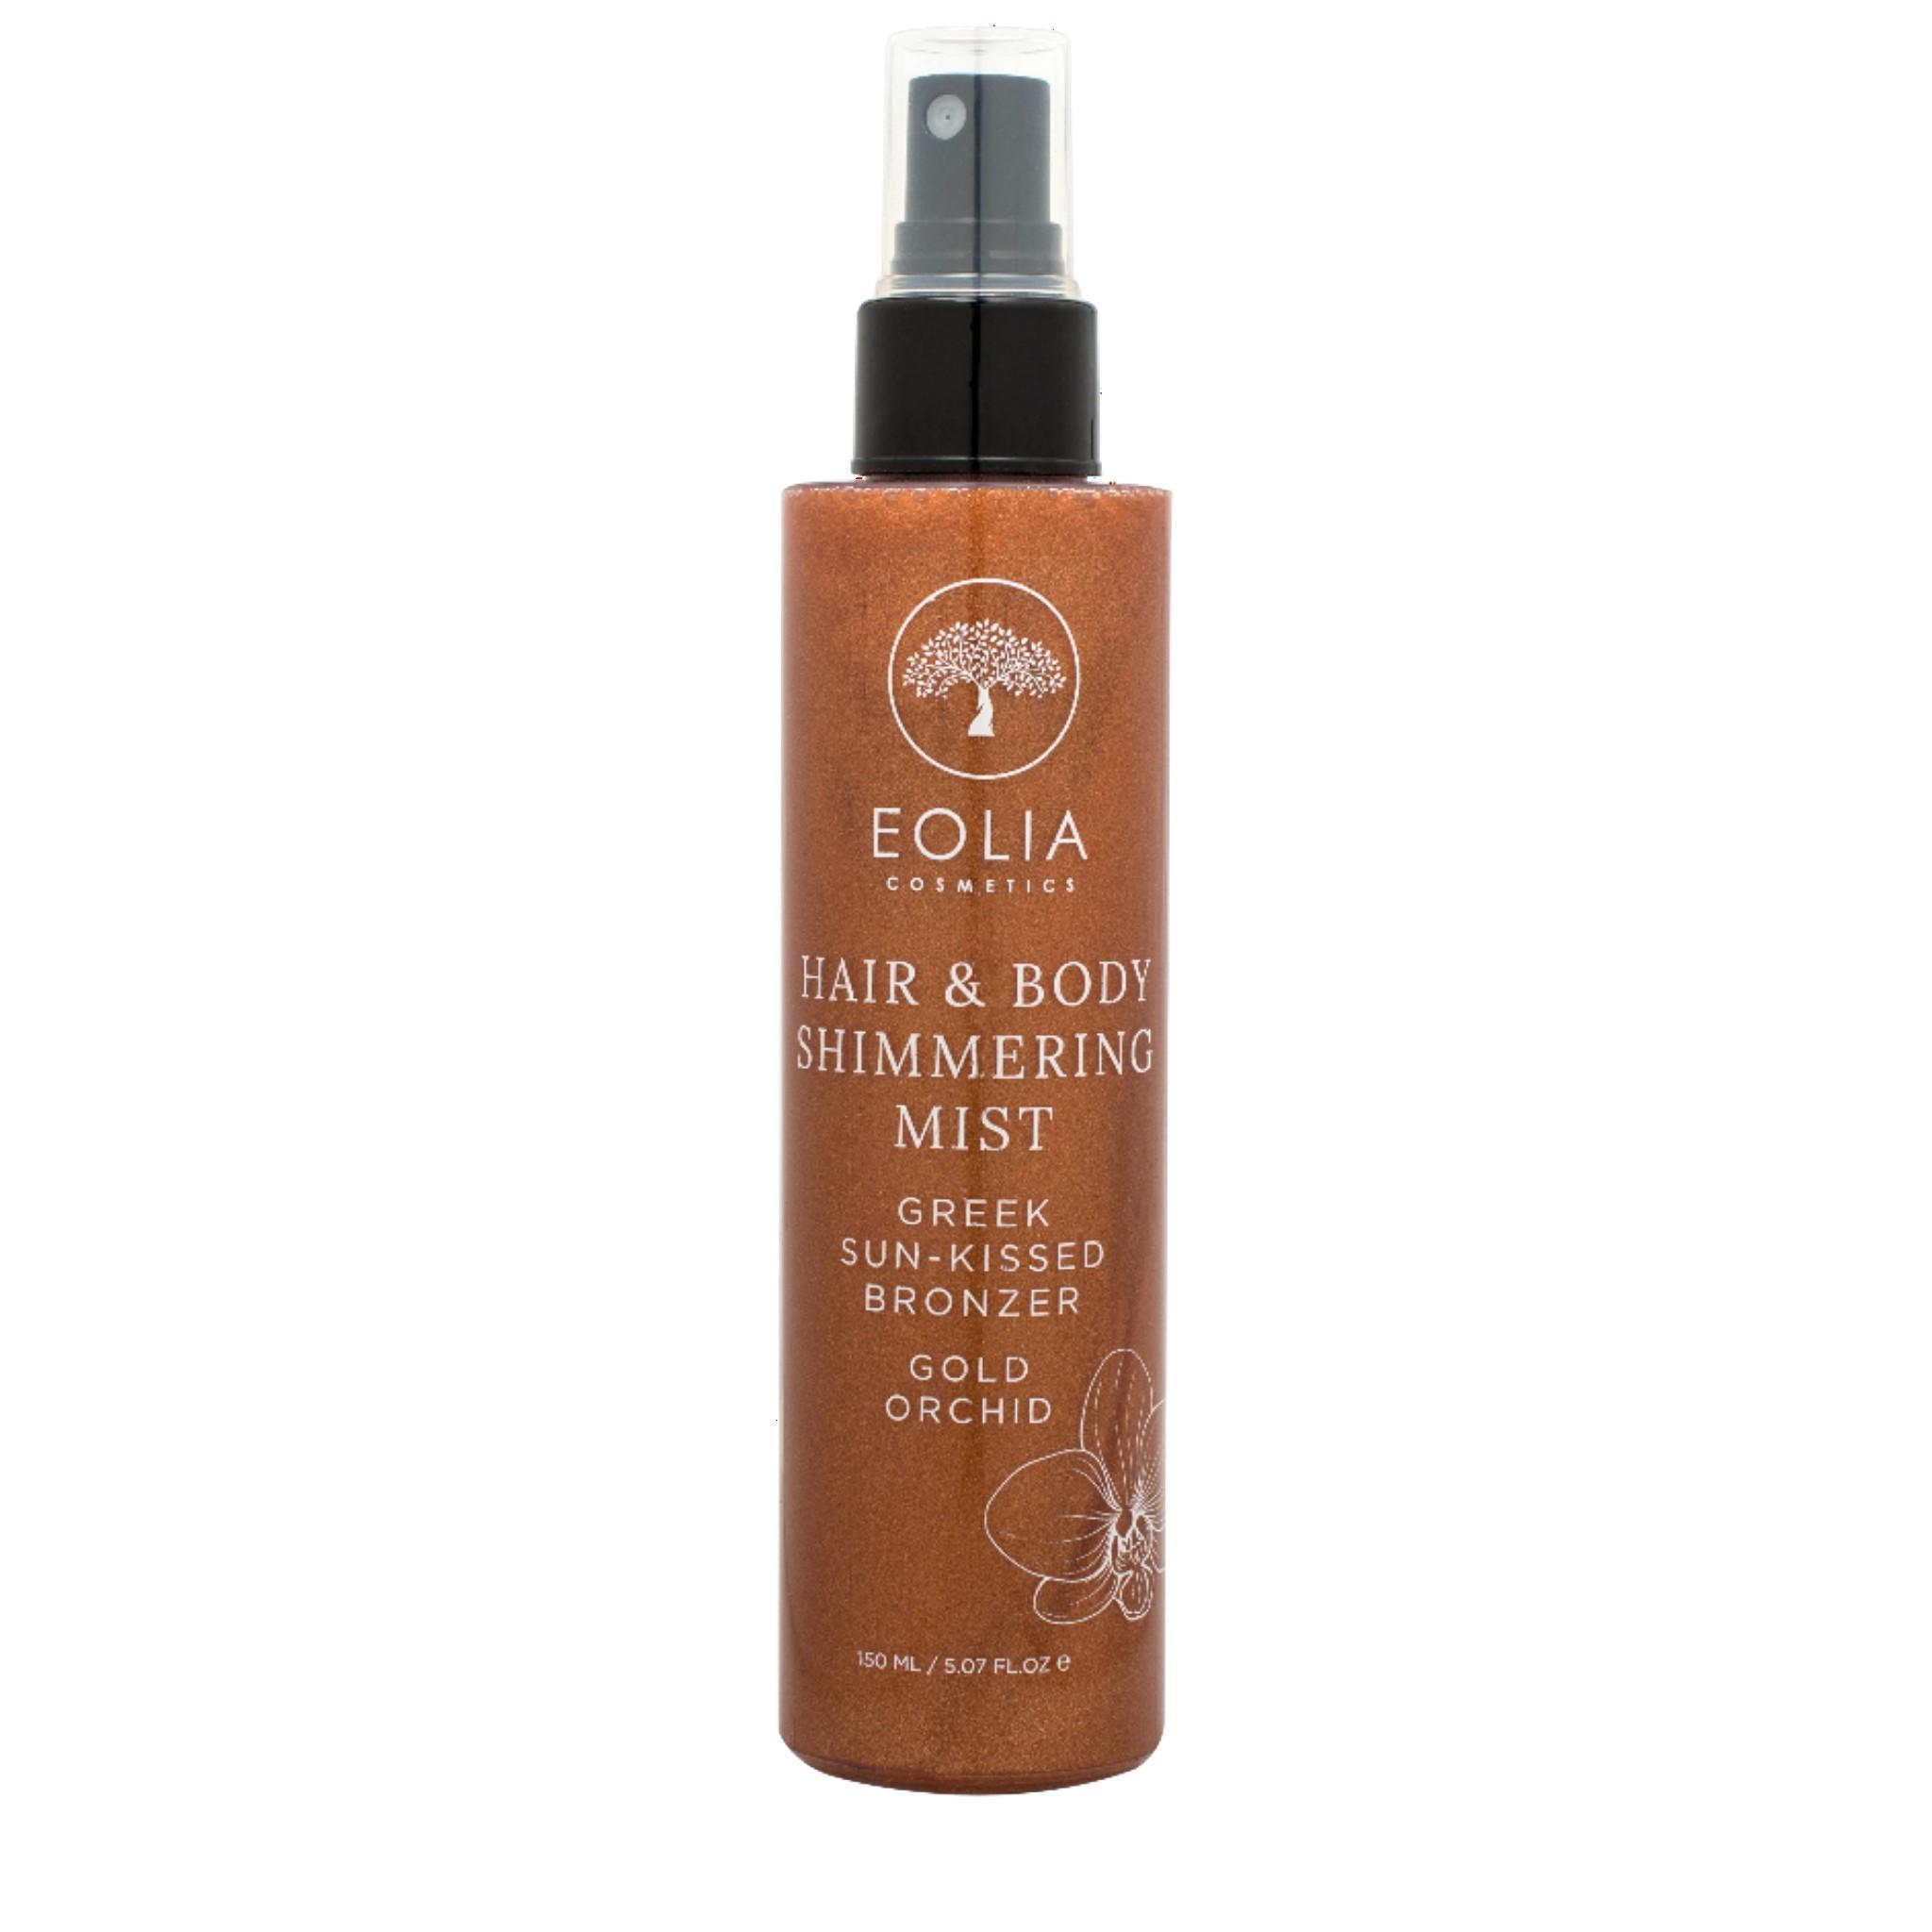 Hair & Body Shimmering Mist με άρωμα Χρυσής Ορχιδέας 150ml, από την Eolia Cosmetics